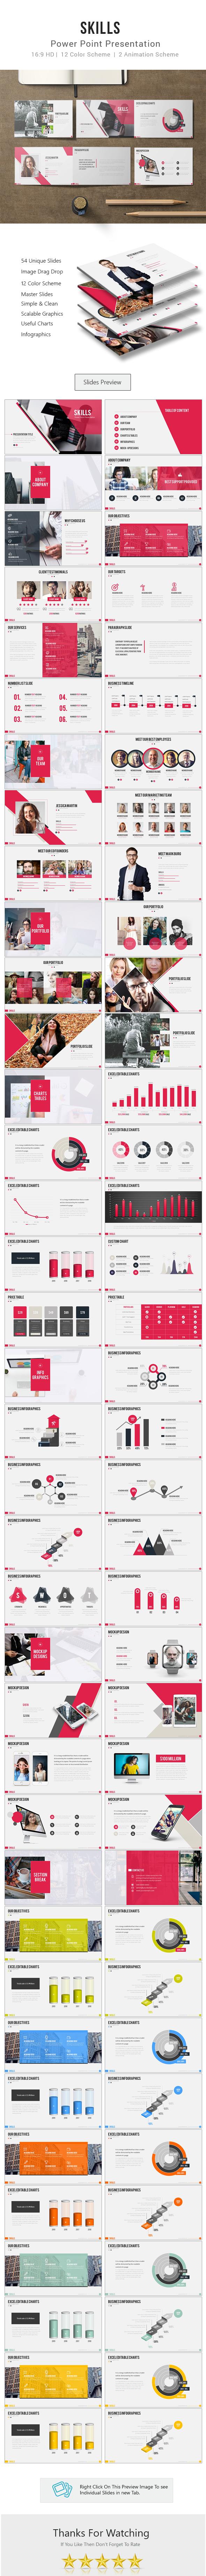 Skills Power Point Presentation - Business PowerPoint Templates